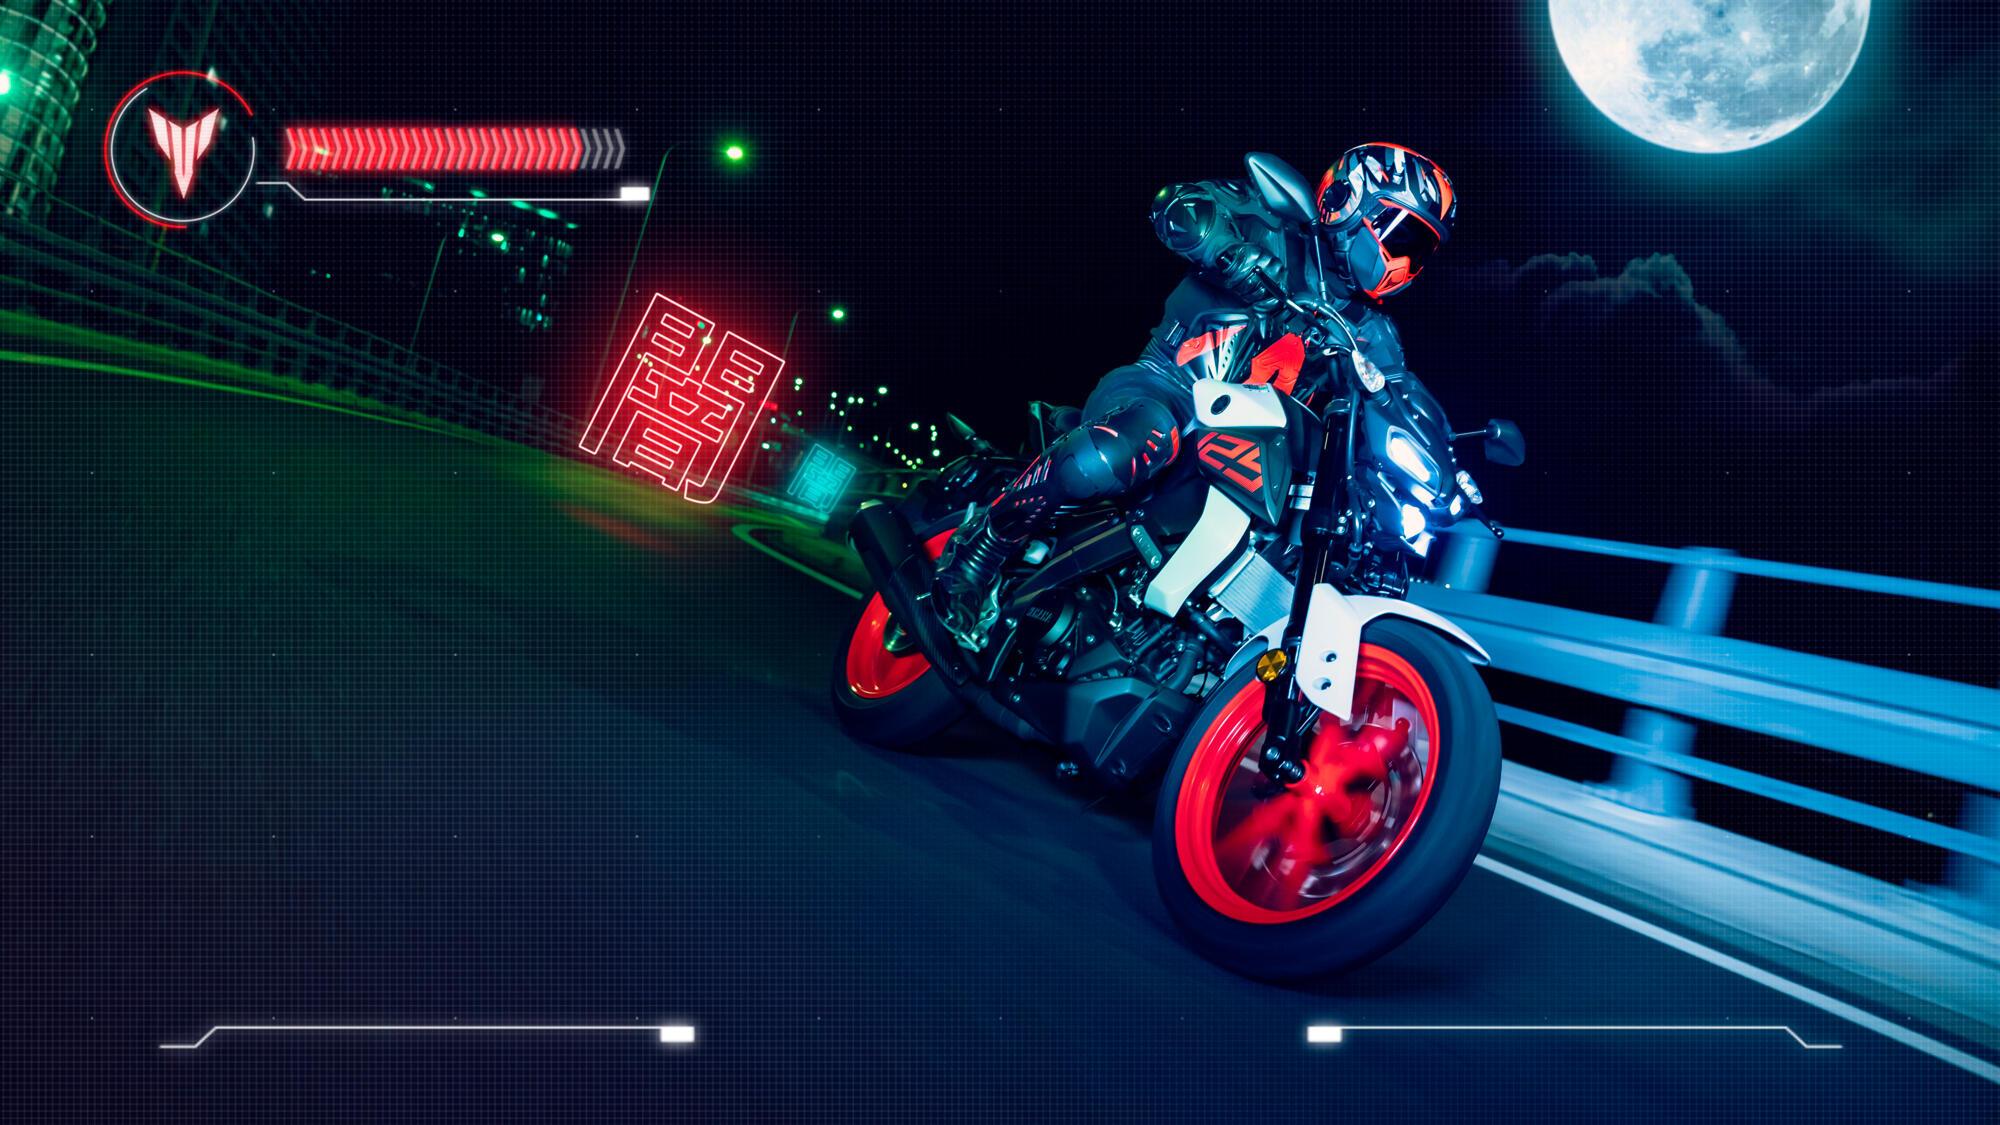 2020-Yamaha-MT125-EU-Ice_Fluo-Action-001